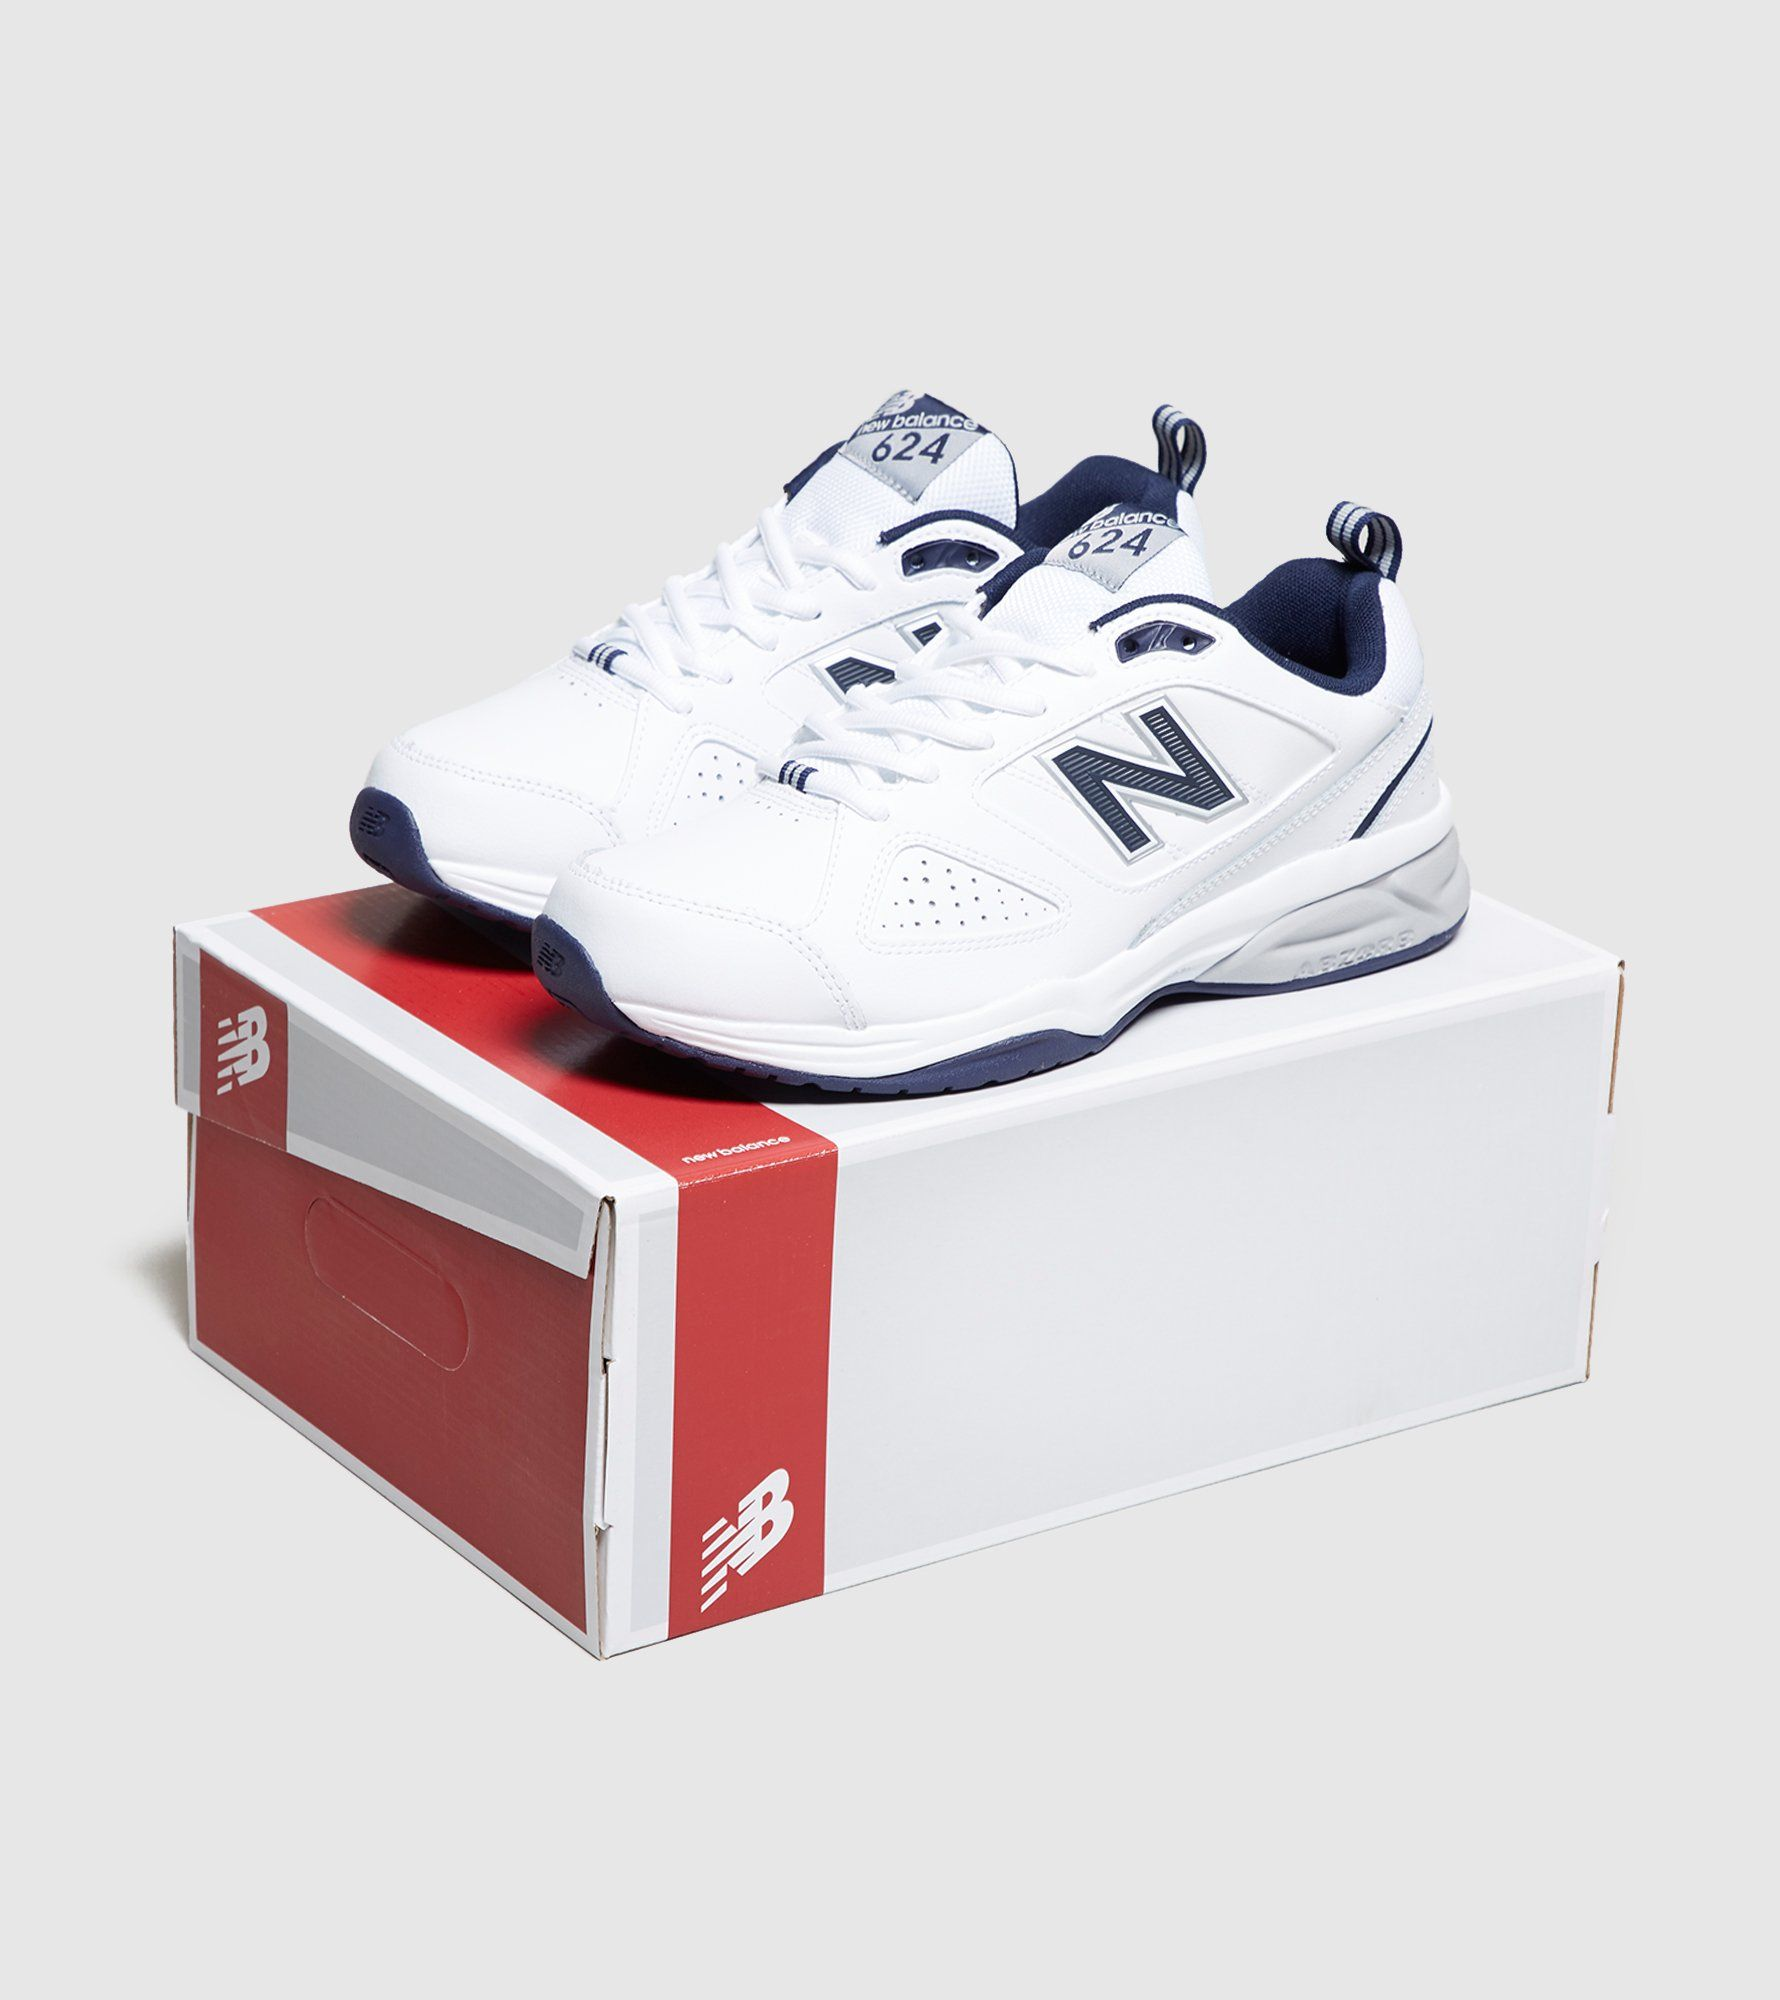 New Balance 624V4 Fitness Shoes